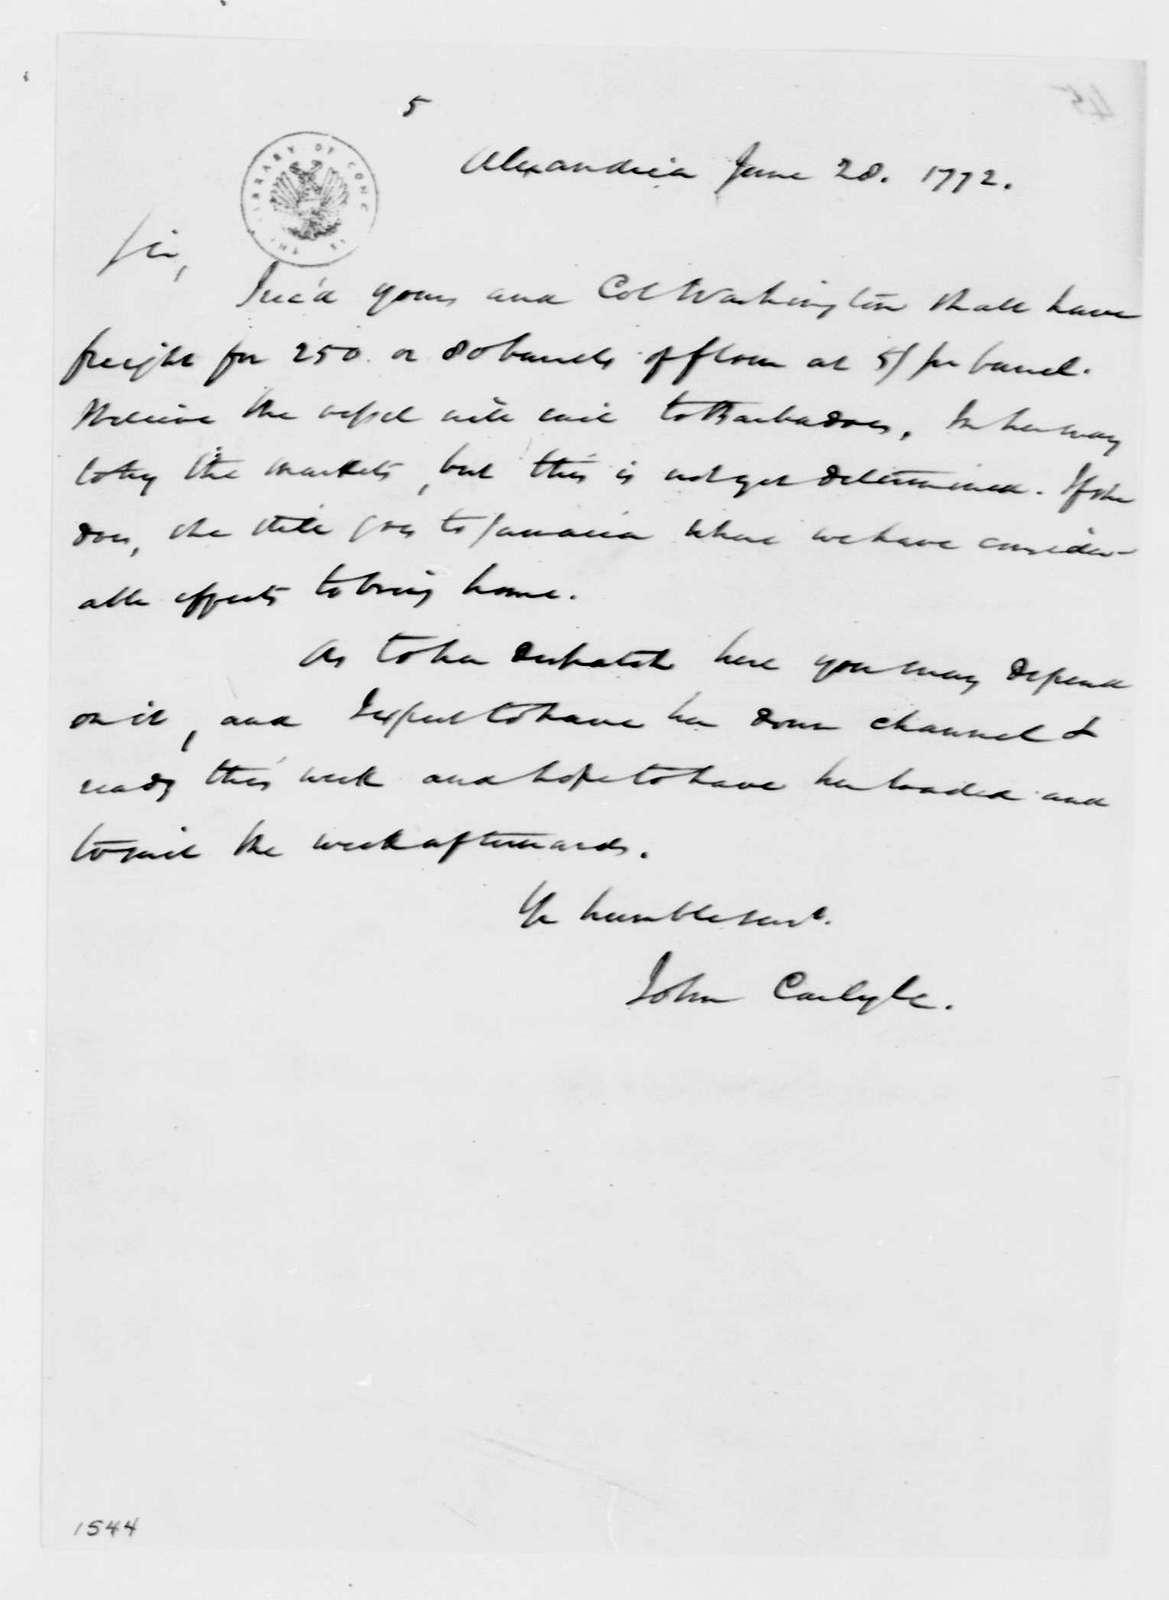 George Washington Papers, Series 4, General Correspondence: John Carlyle to George Washington, June 28, 1772, 19th-century transcription by William B. Sprague